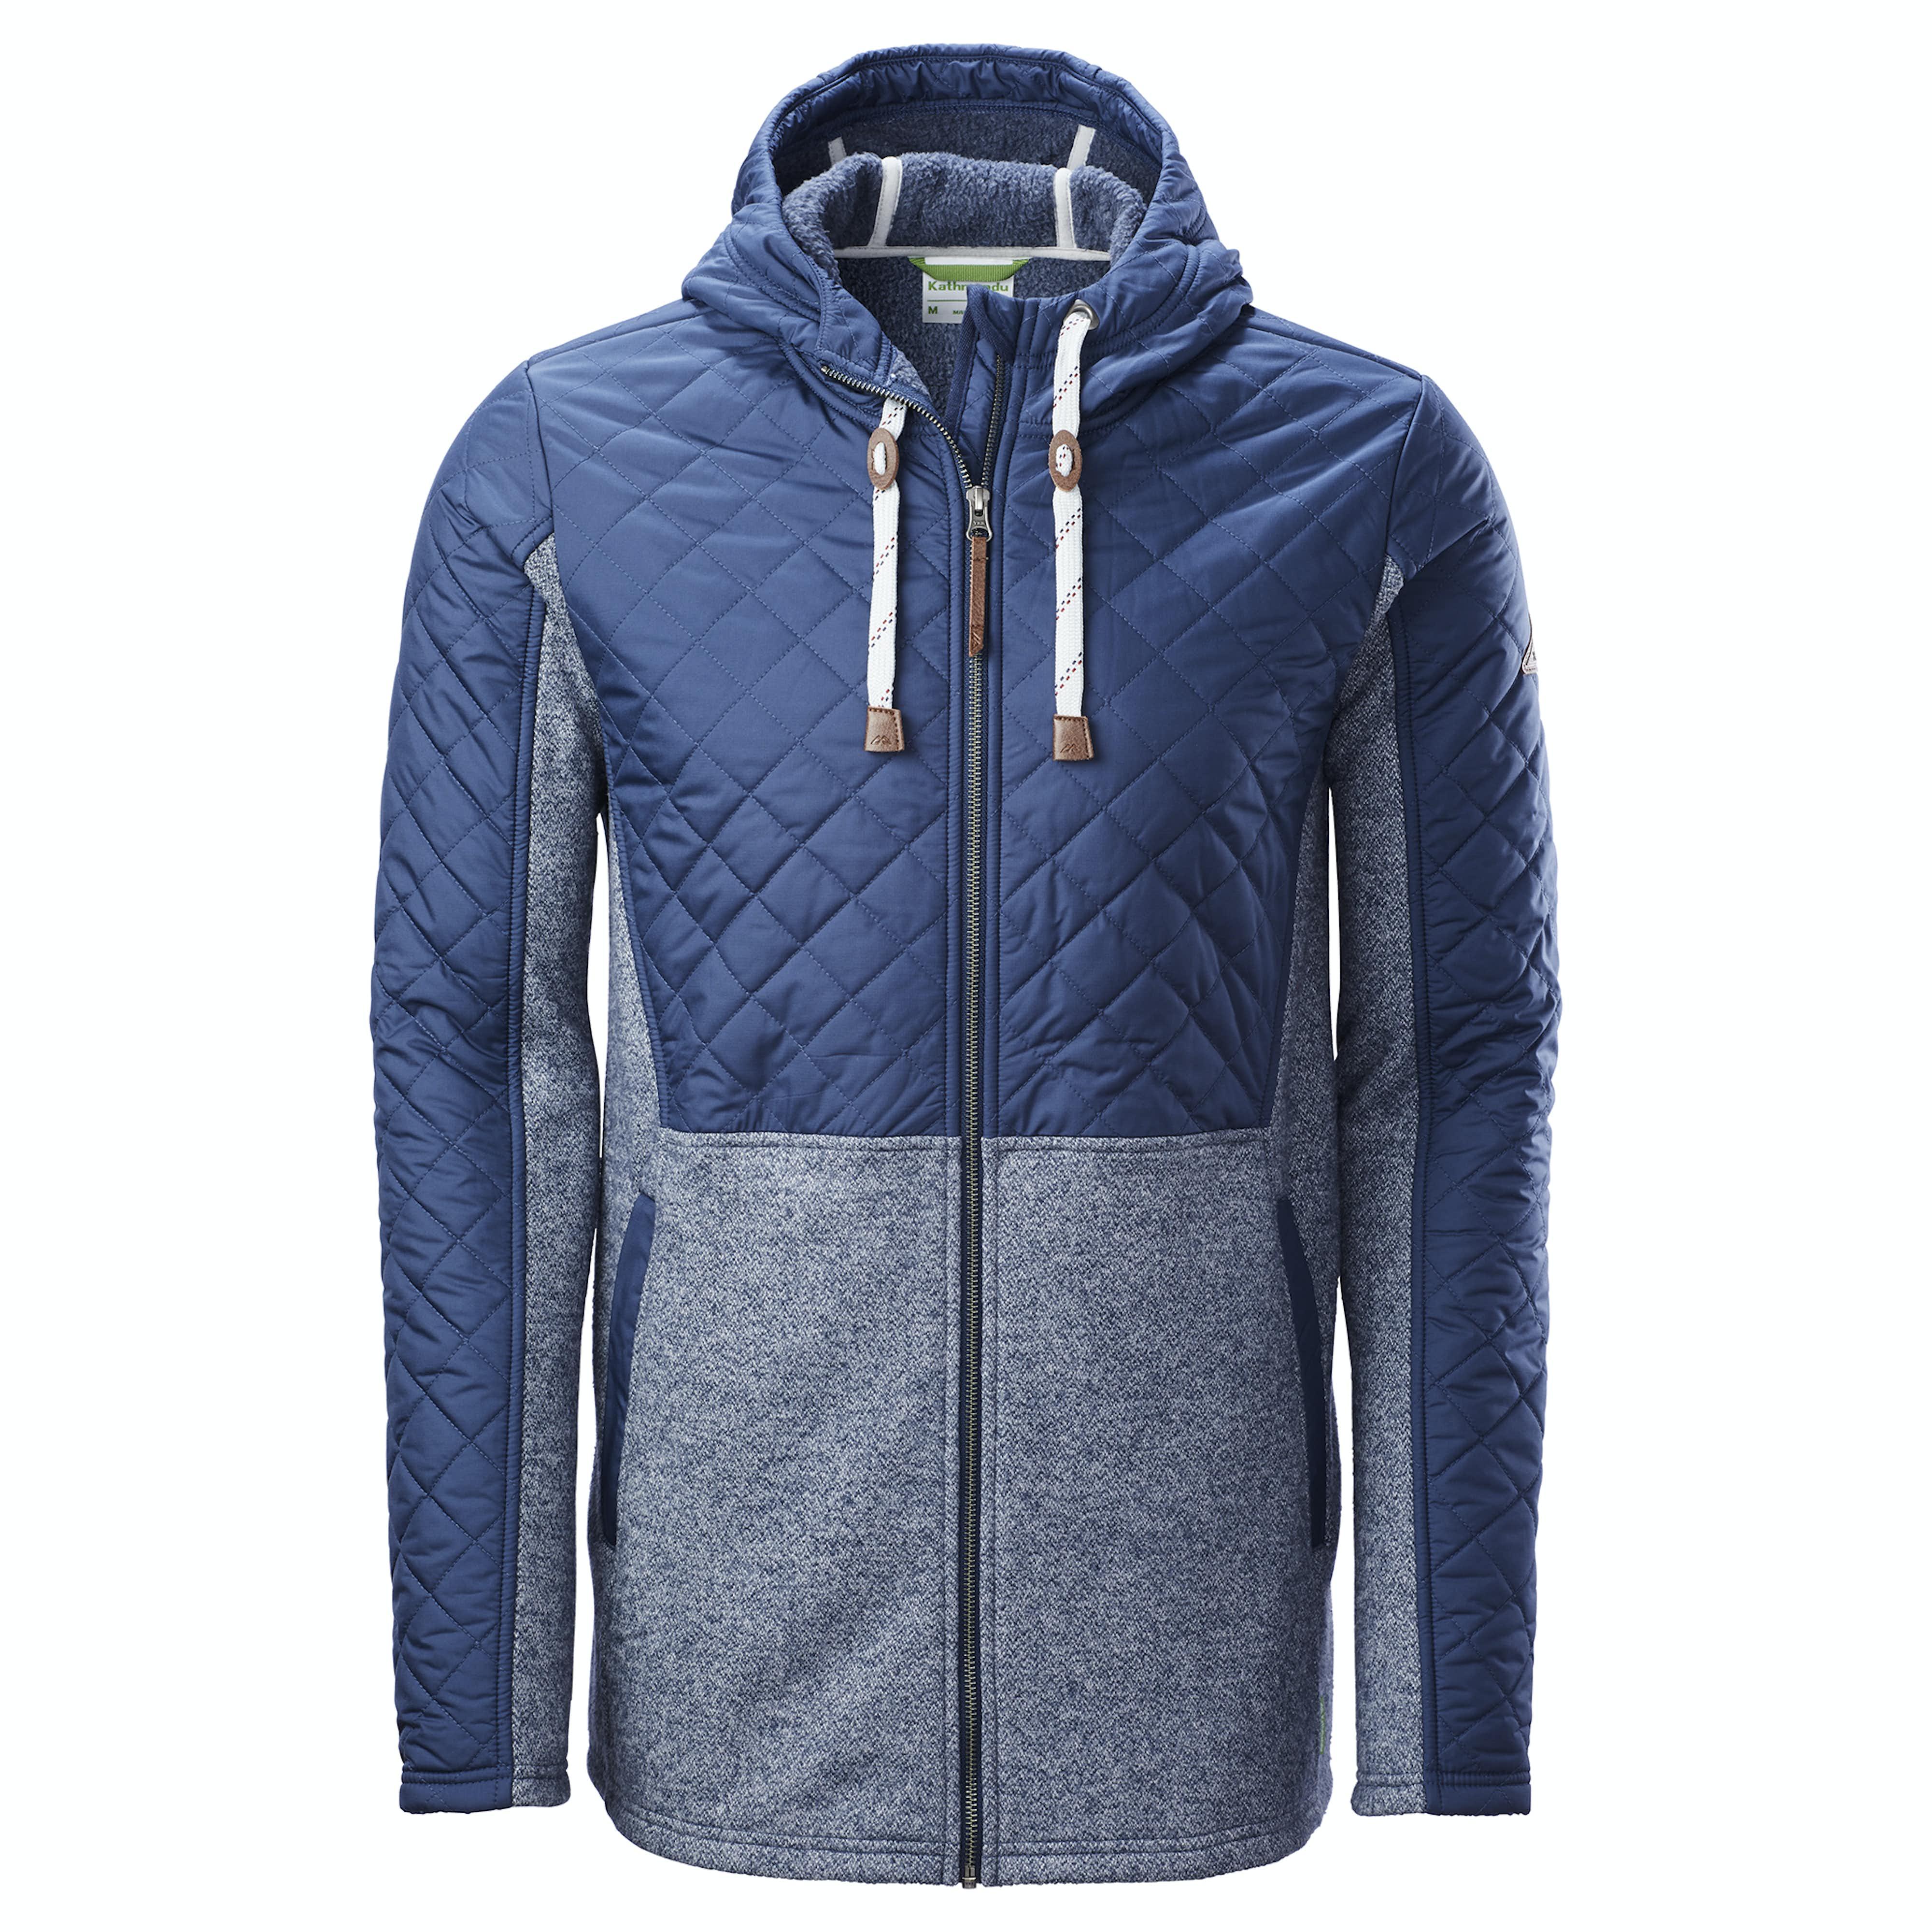 1bbd4b39988c Forerunner Men s Longline Jacket